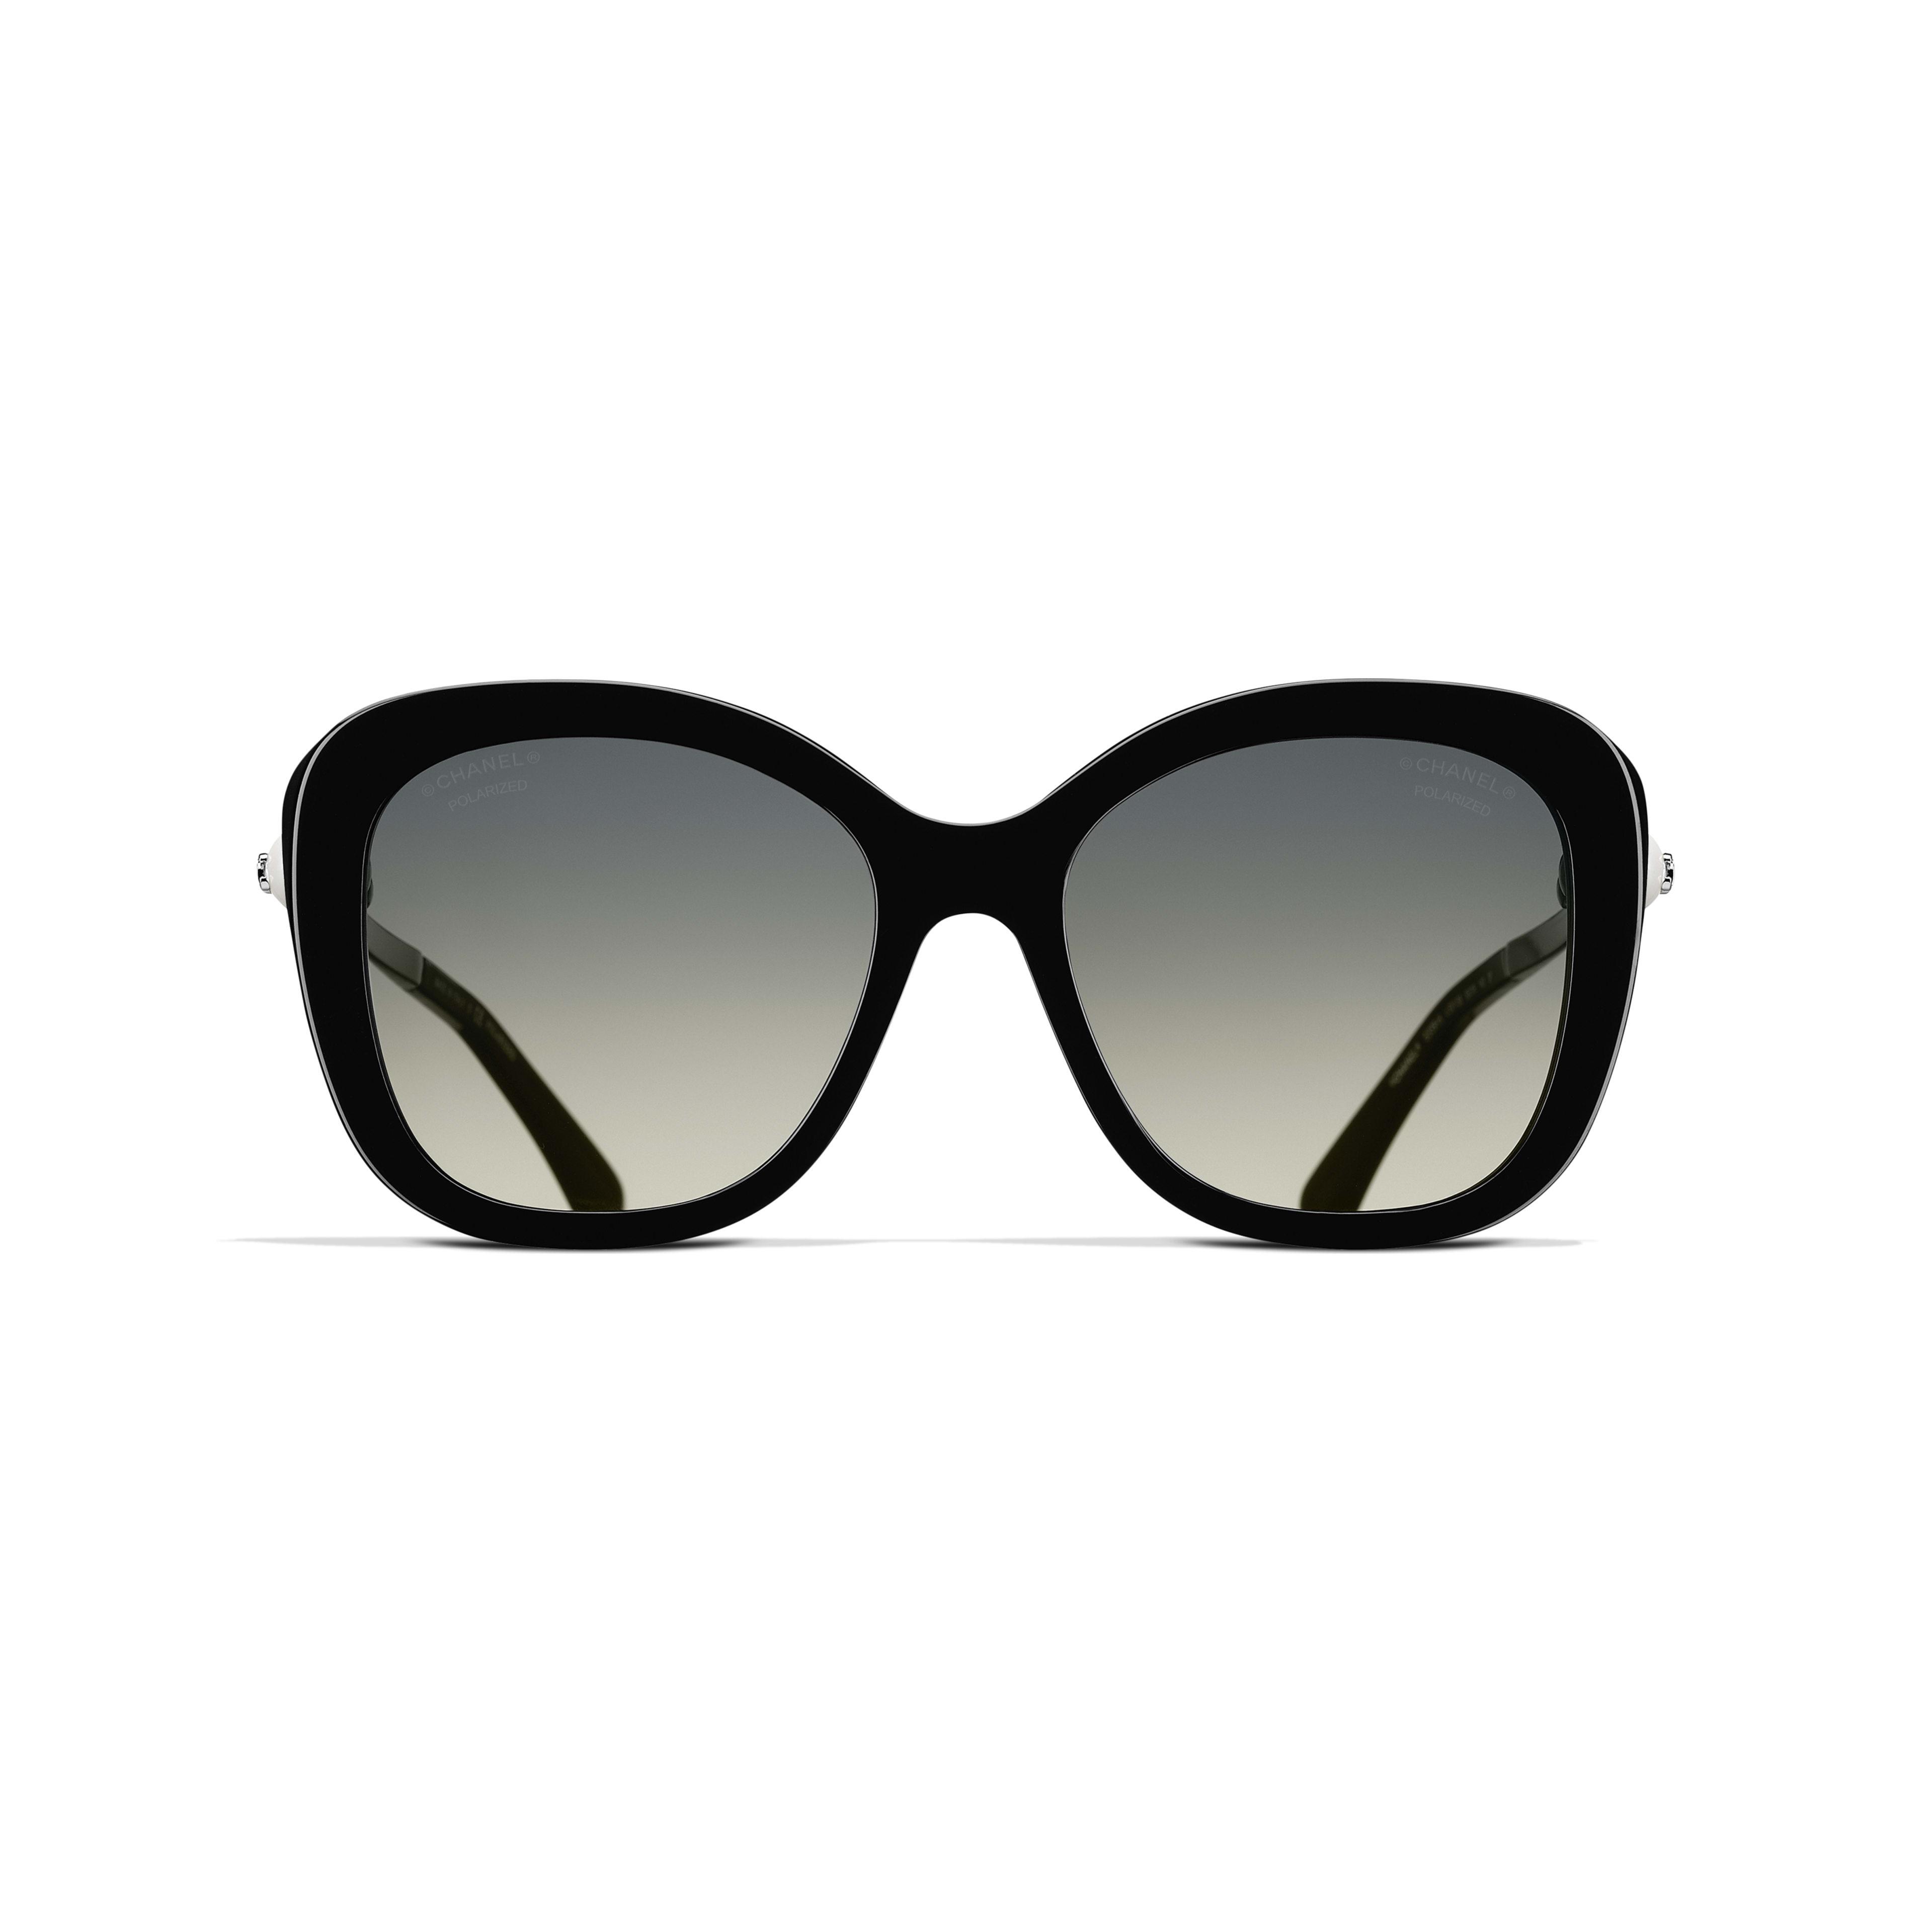 Square Sunglasses Acetate & Imitation Pearls - Polarized Lenses Black -                                                    view 2 - see full sized version